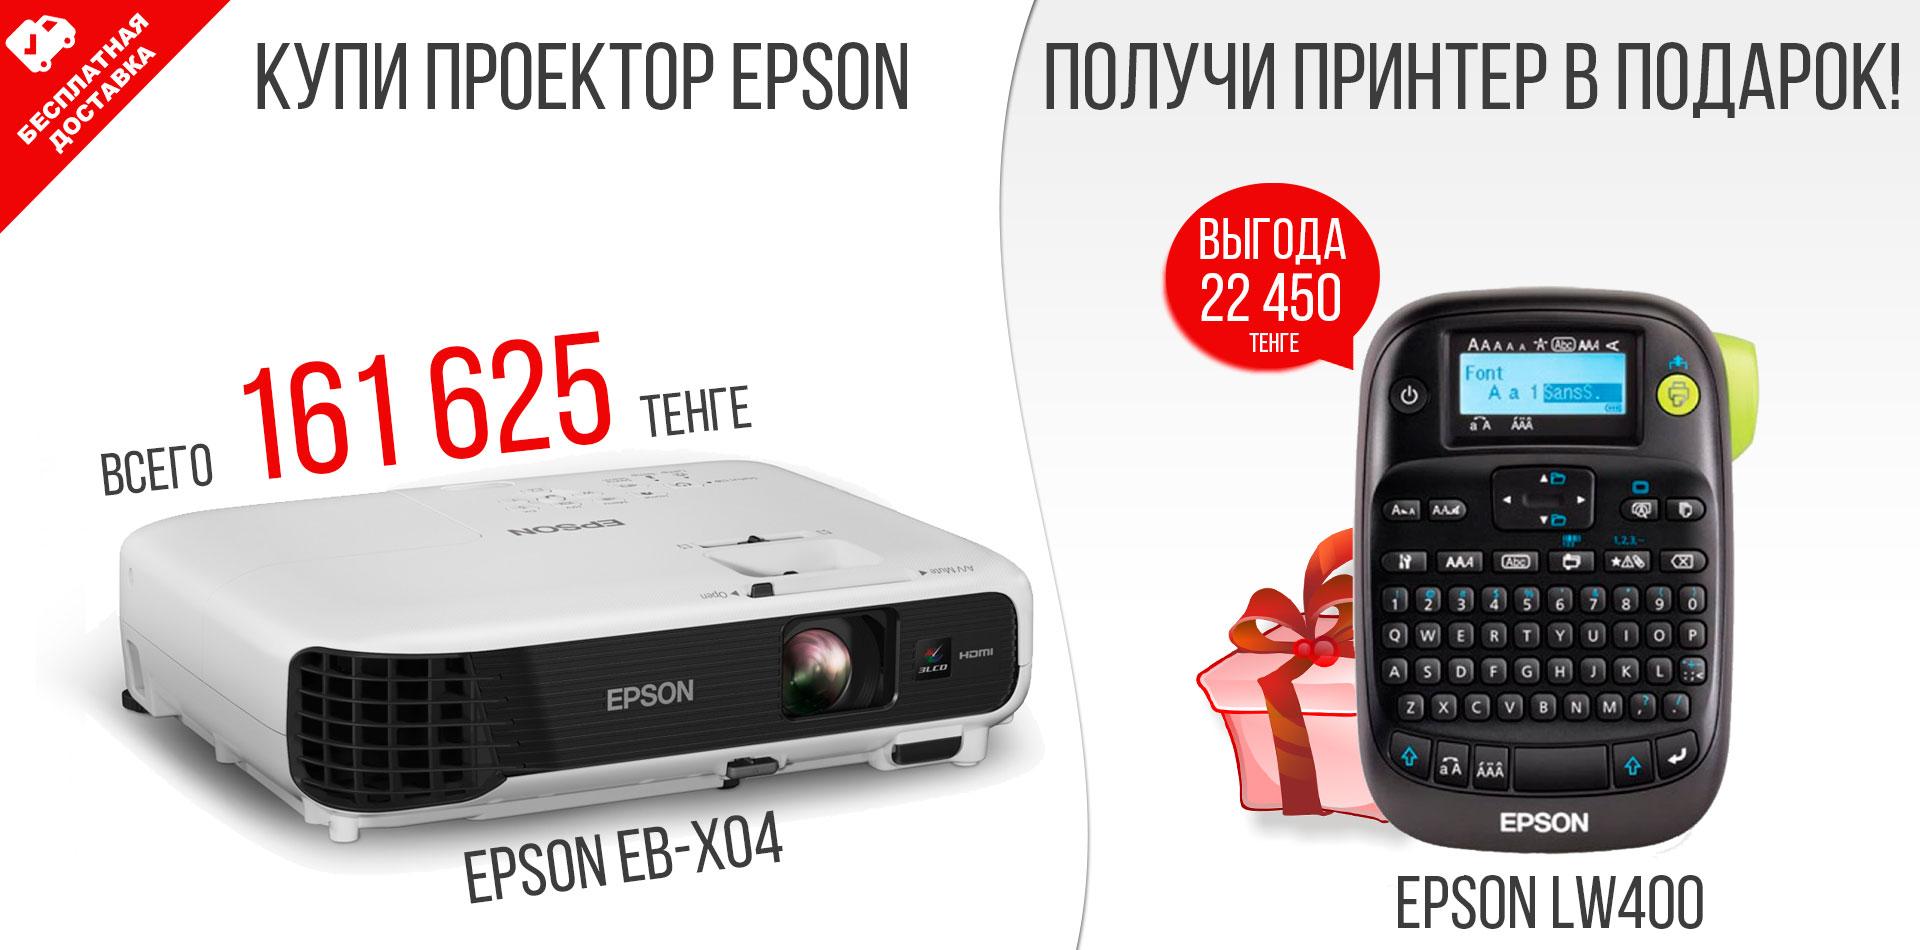 EB-X04 В АСТАНЕ.